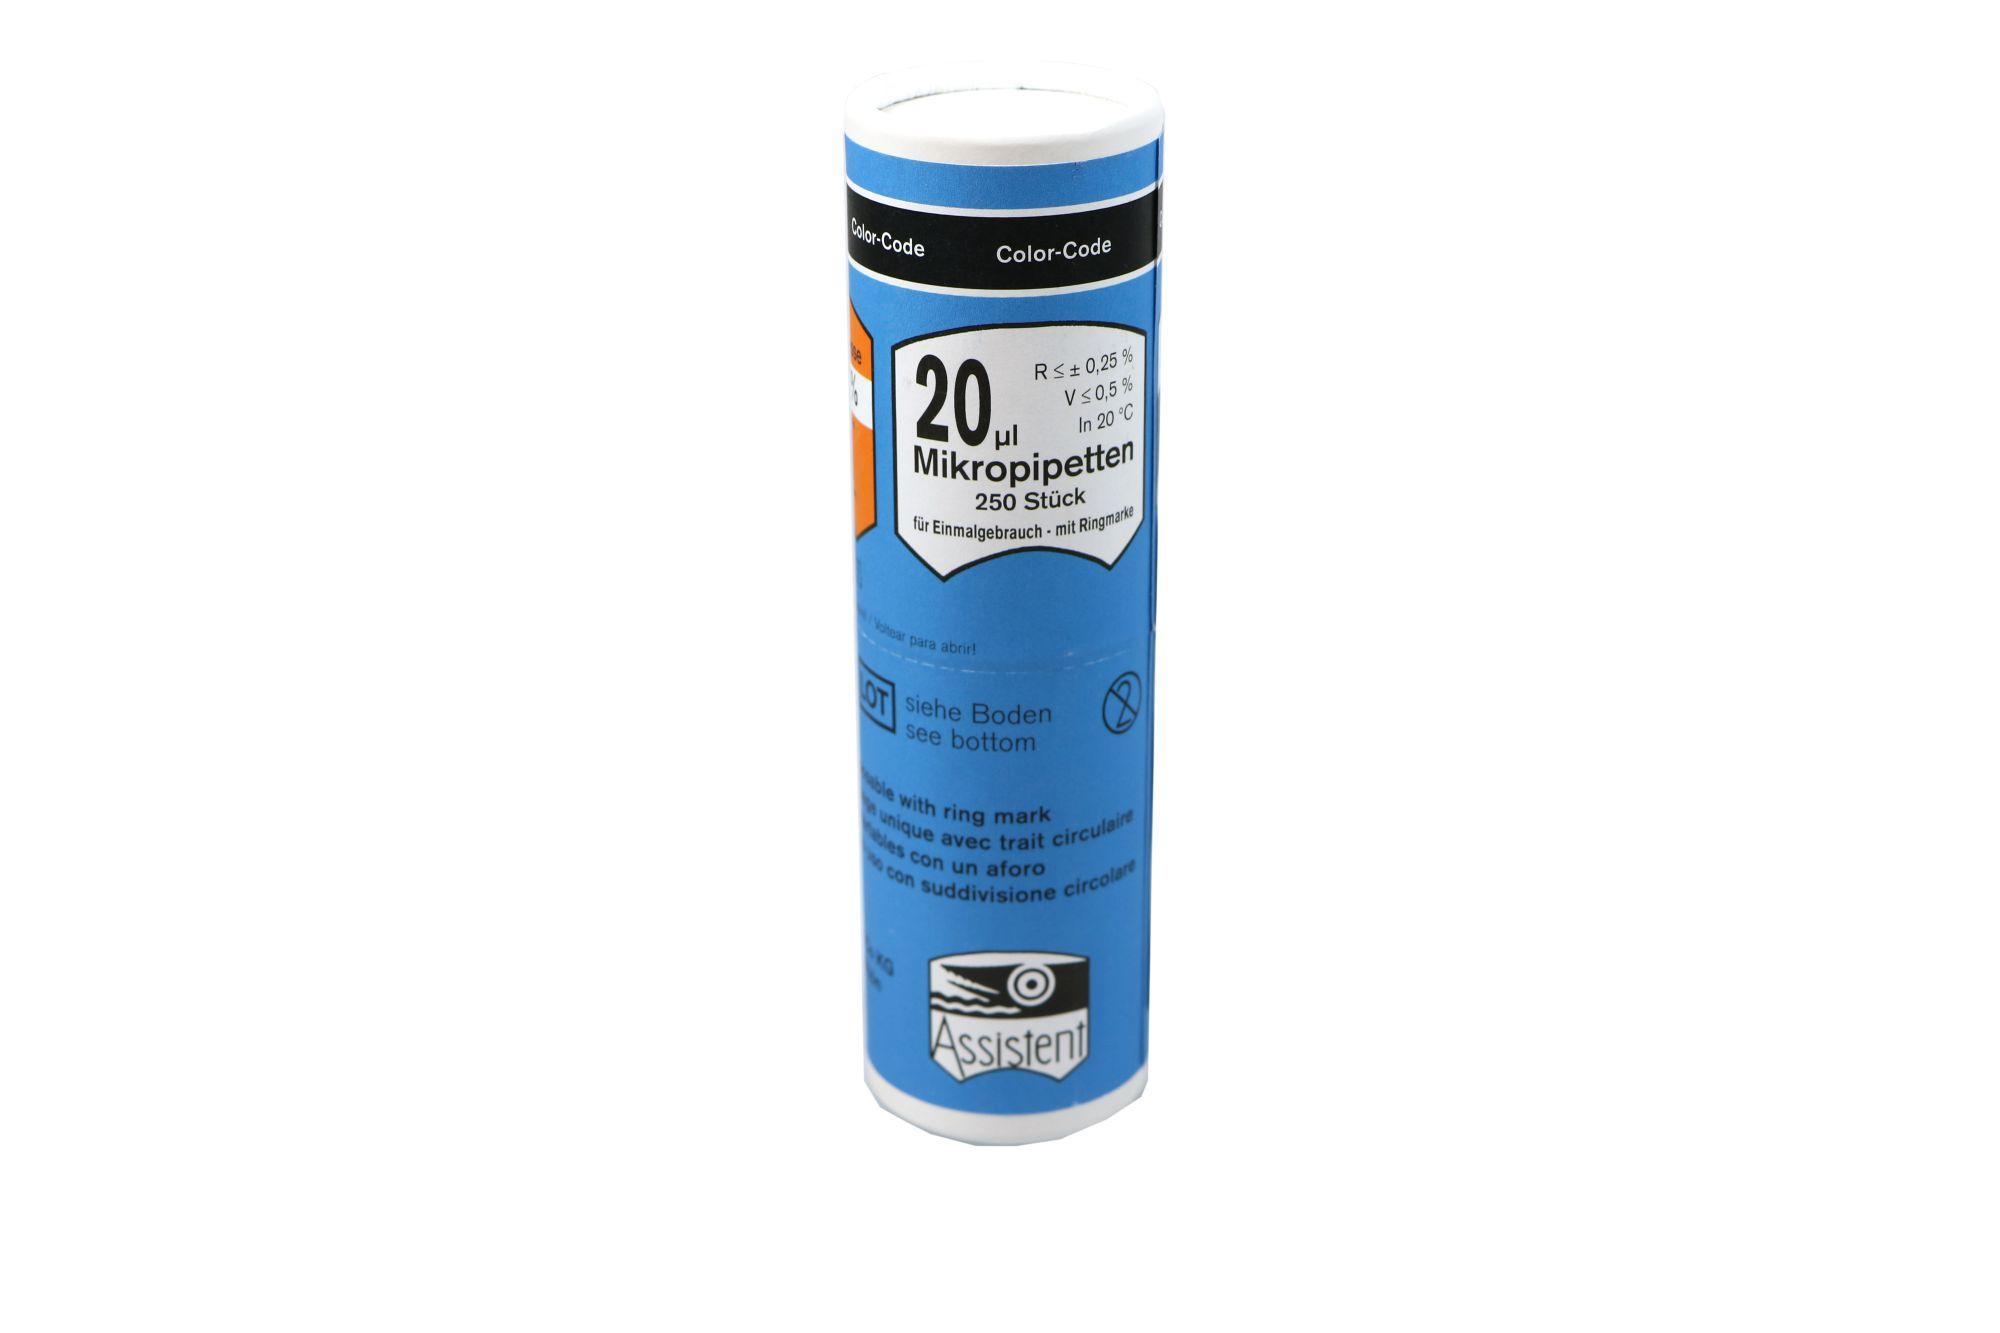 mt hard glass capillary 50 microliter 250 package